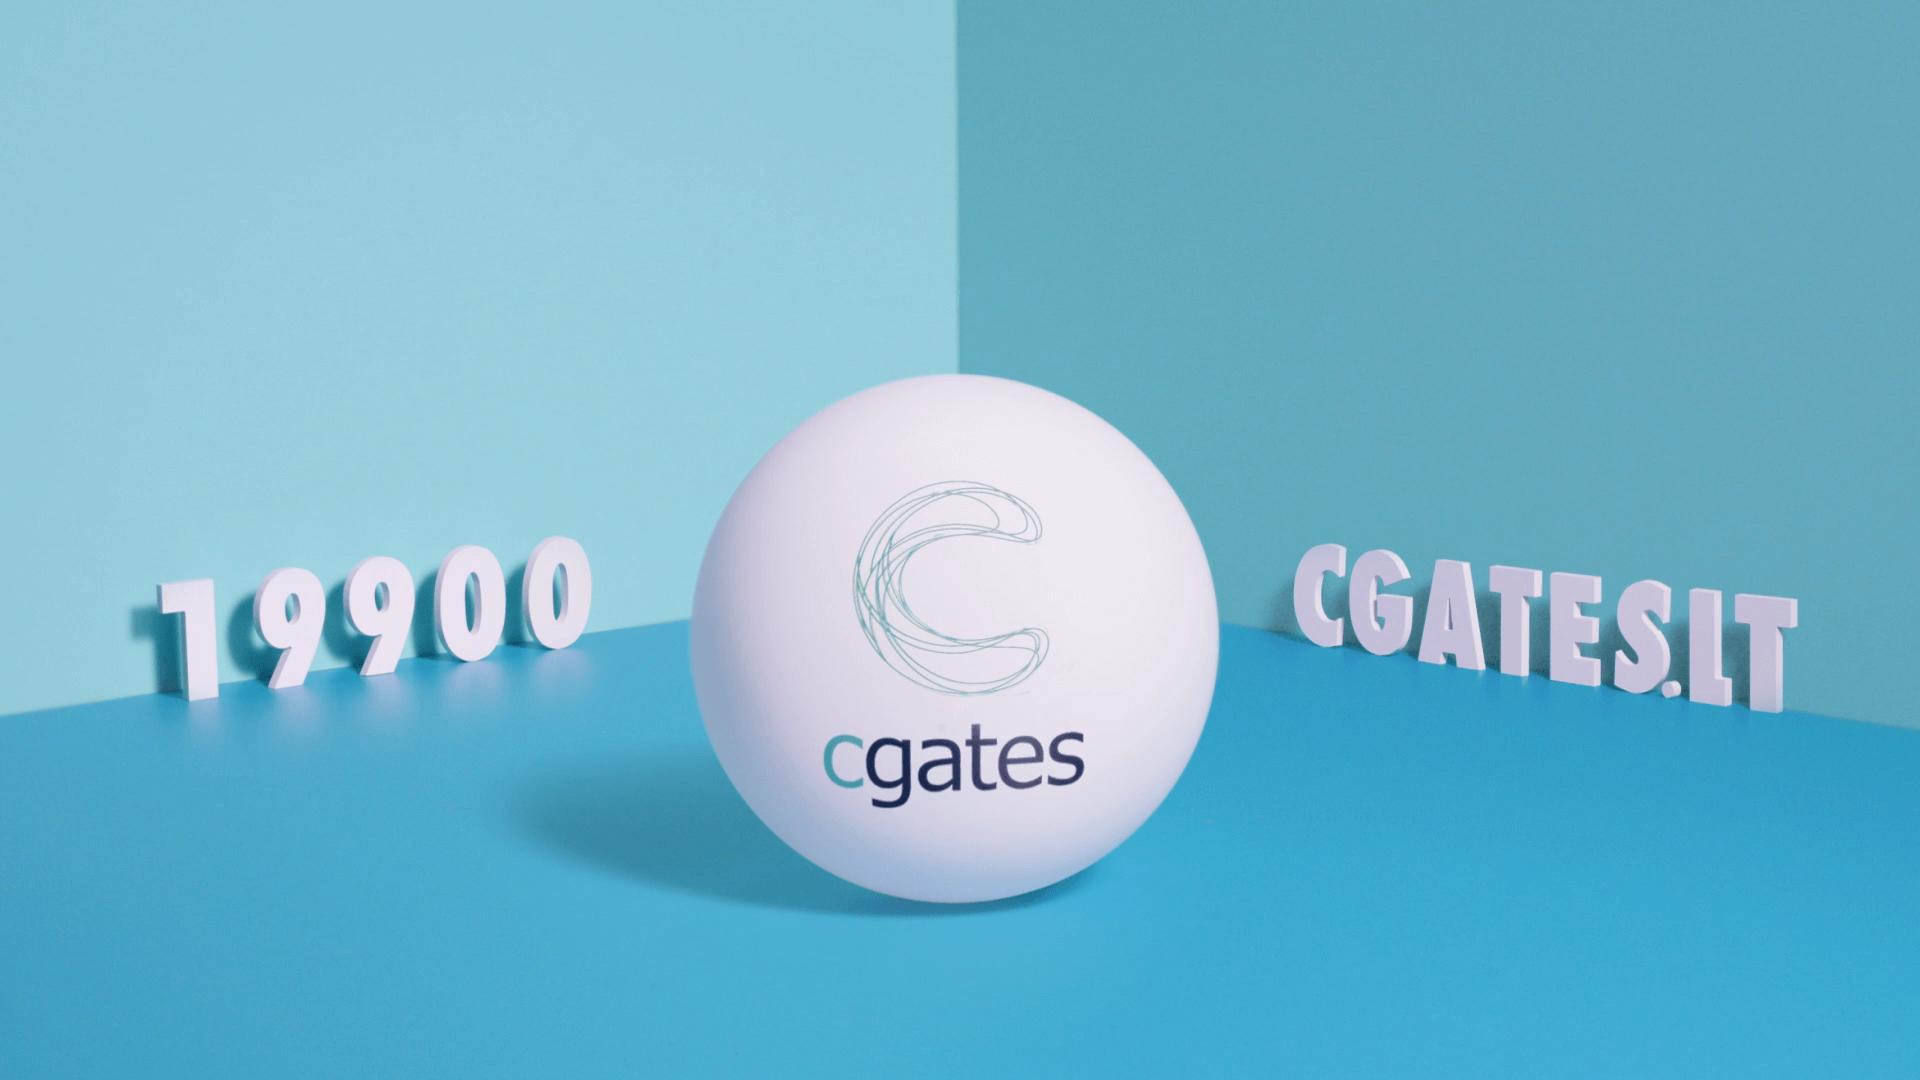 cgates-006